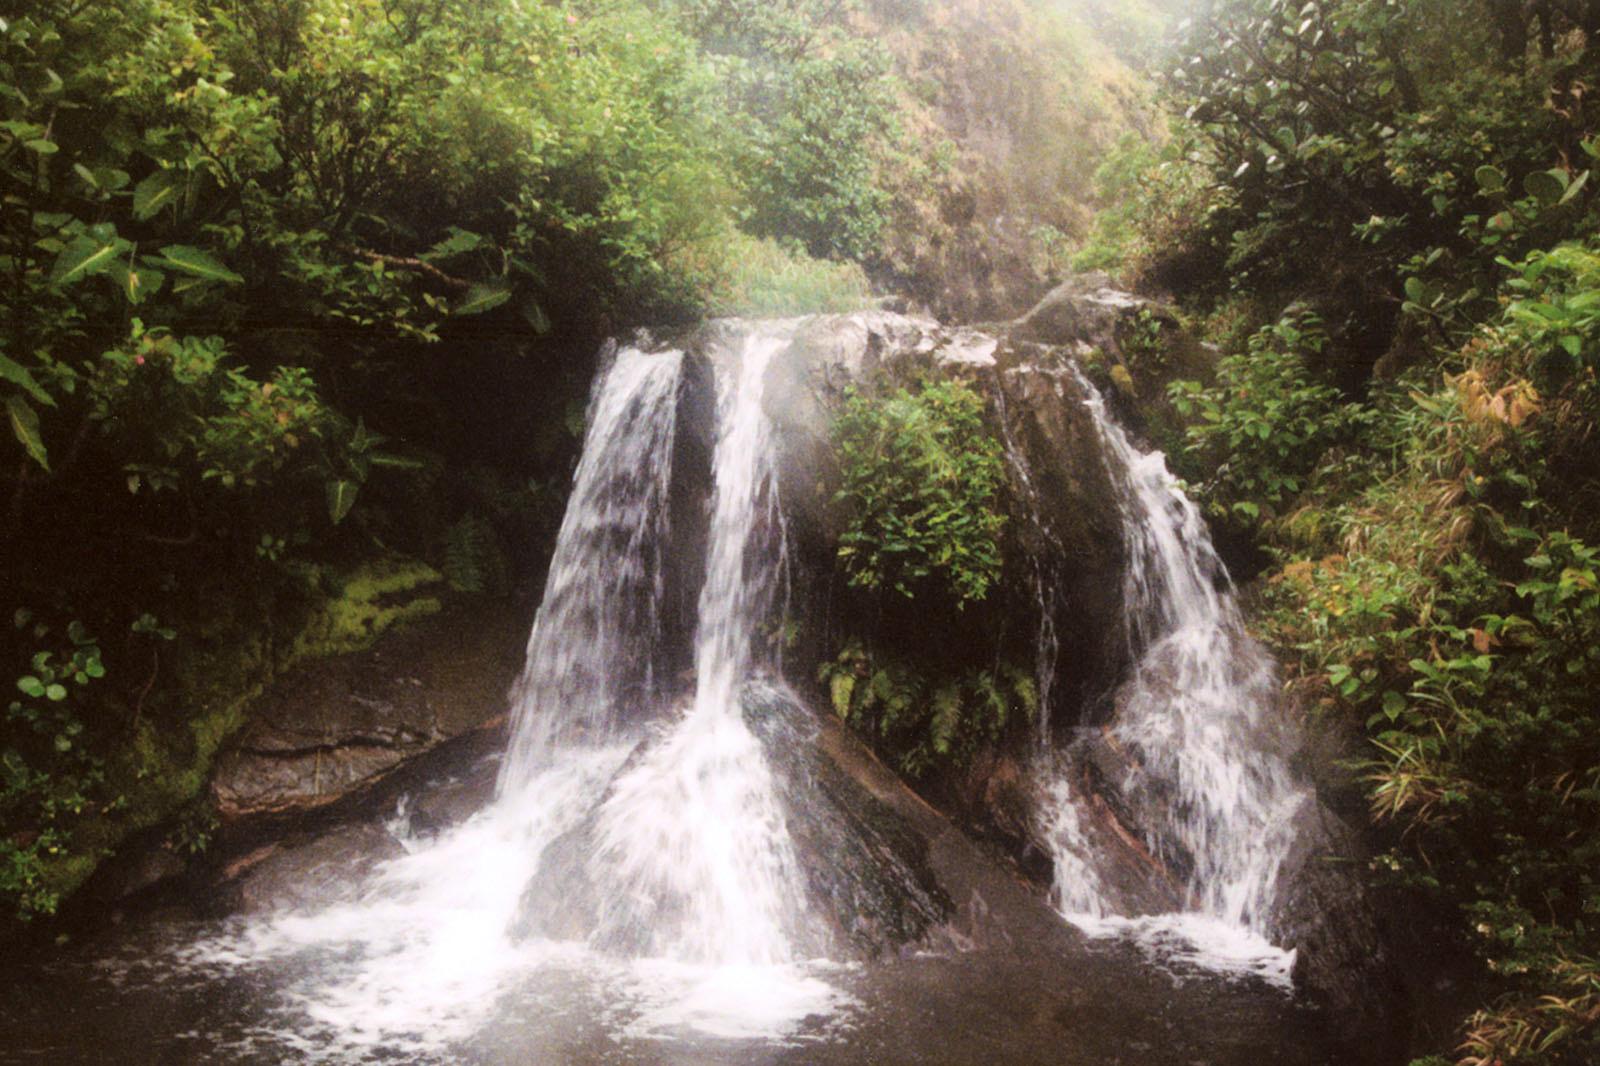 Waterfalls in Rincon de la Vieja National Park